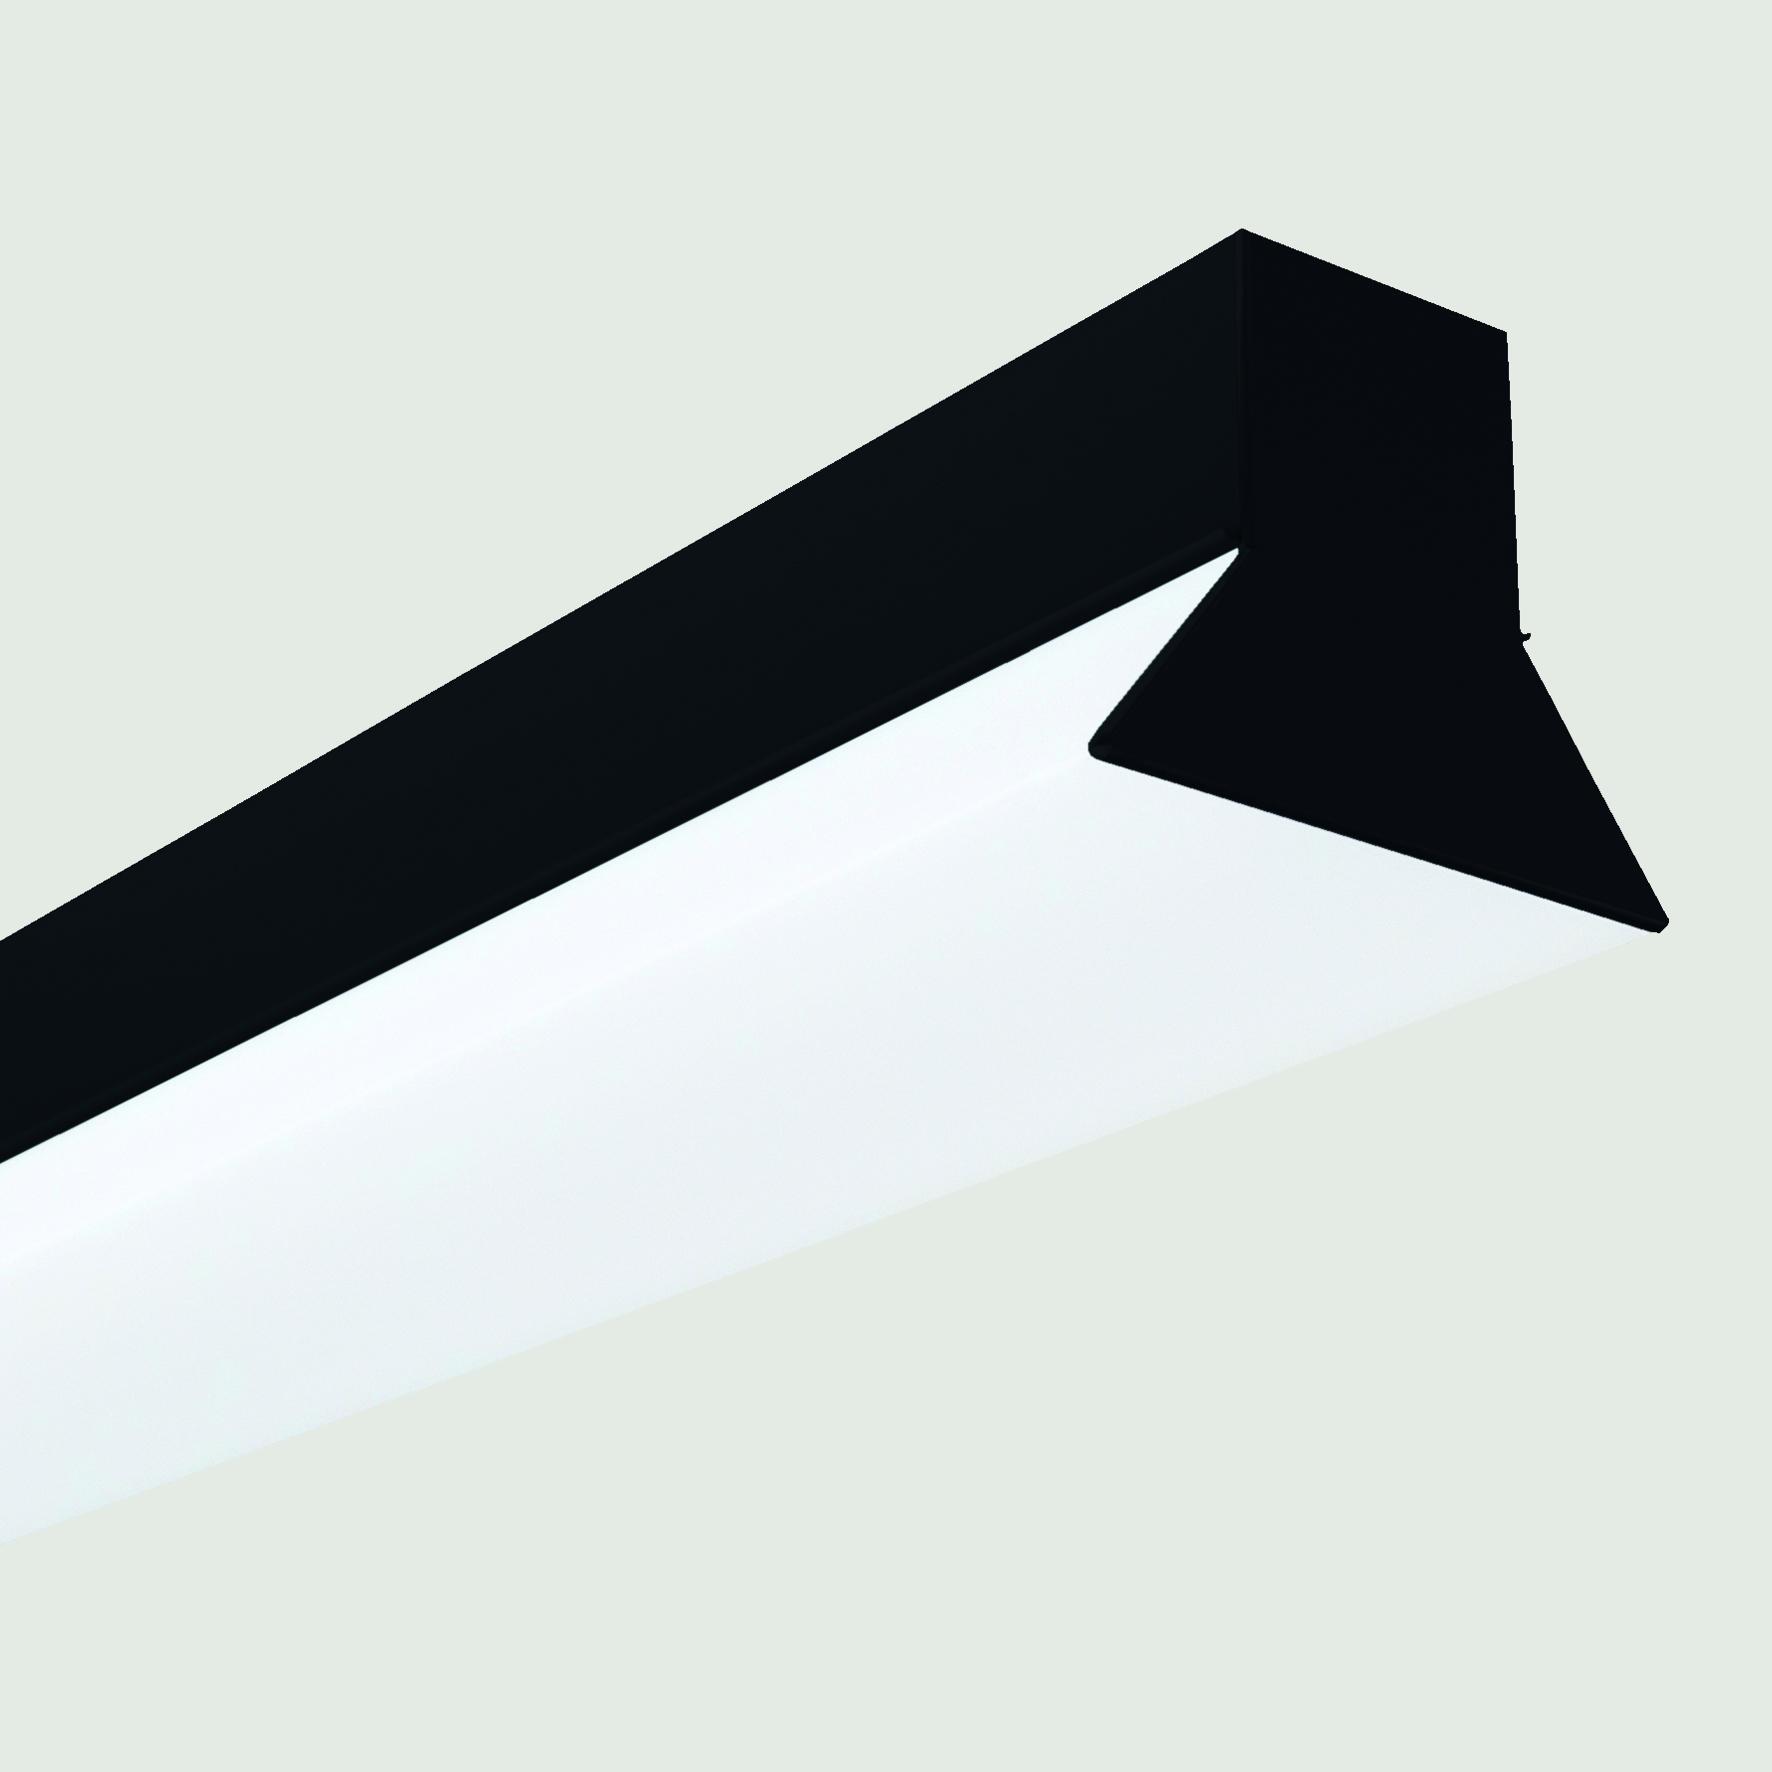 SE40T-profilleuchte-schwarz-sml-led